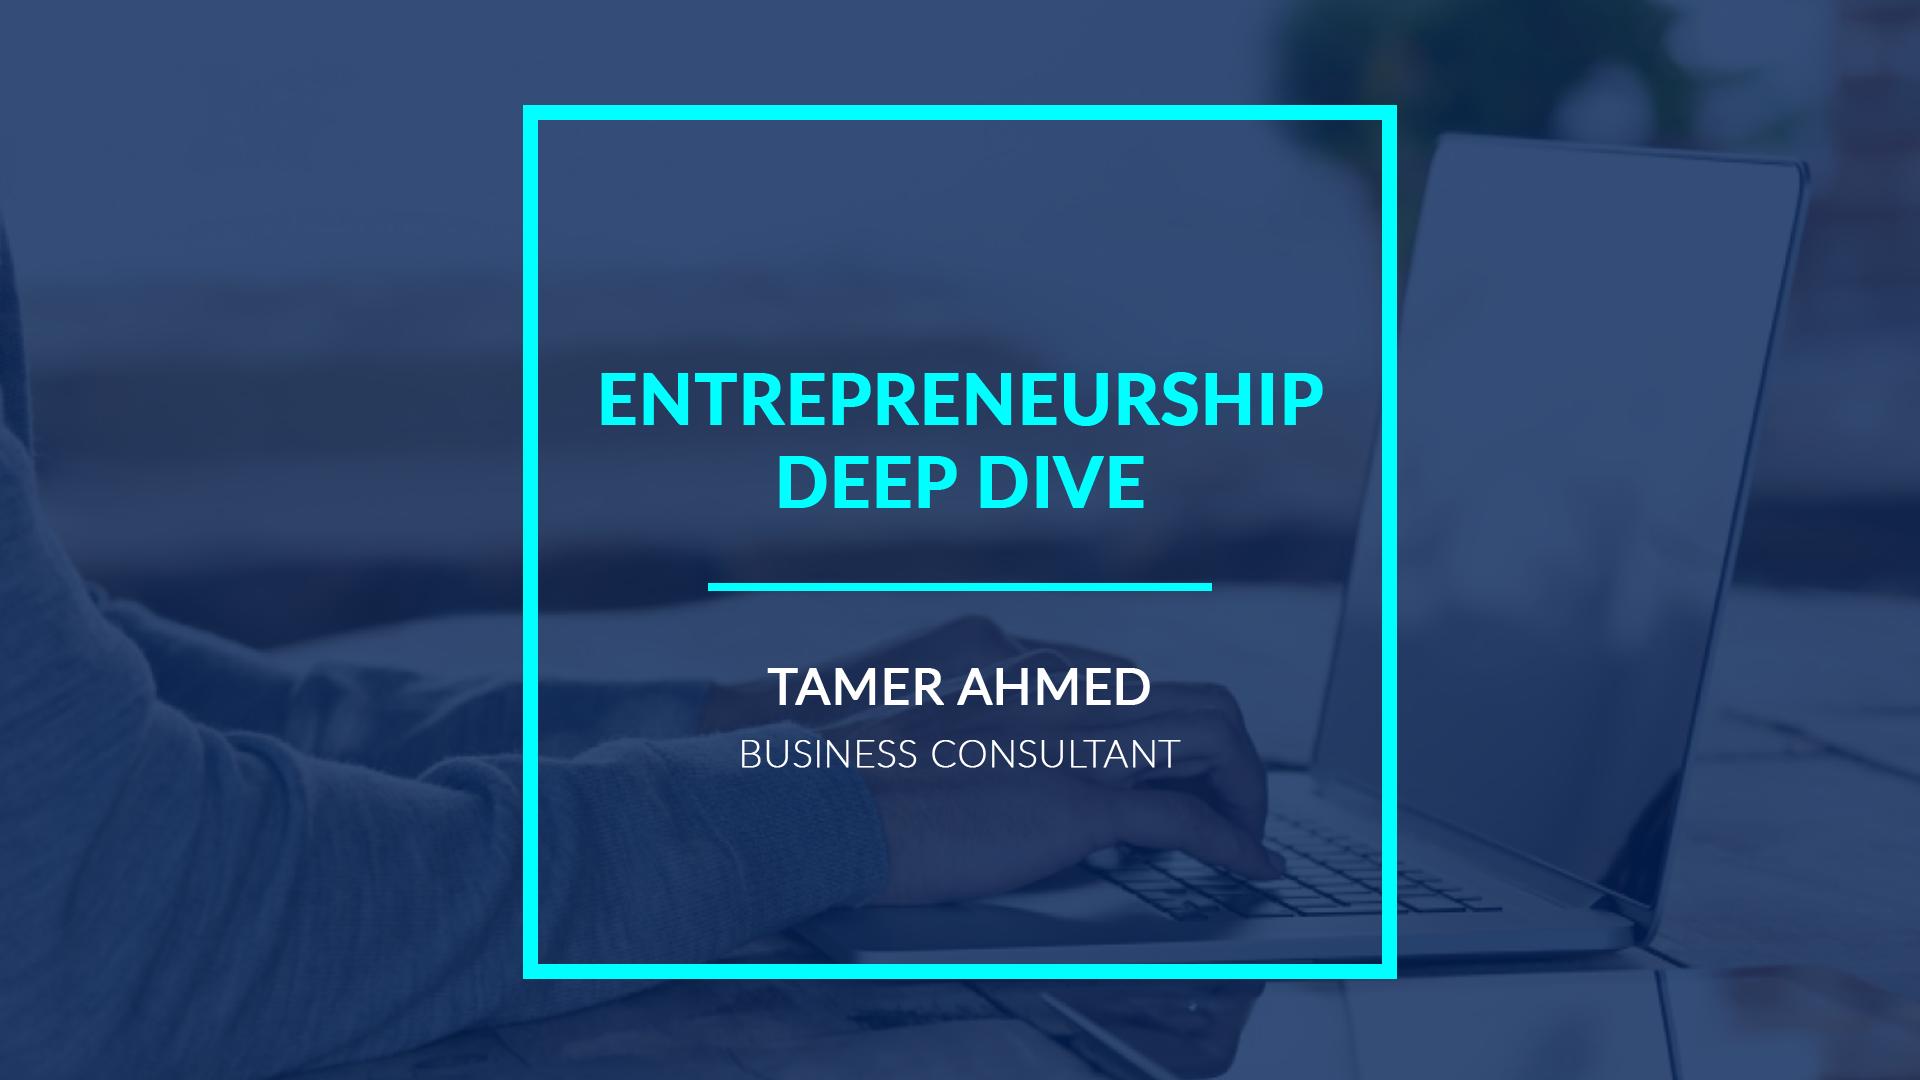 Entrepreneurship Deep Dive